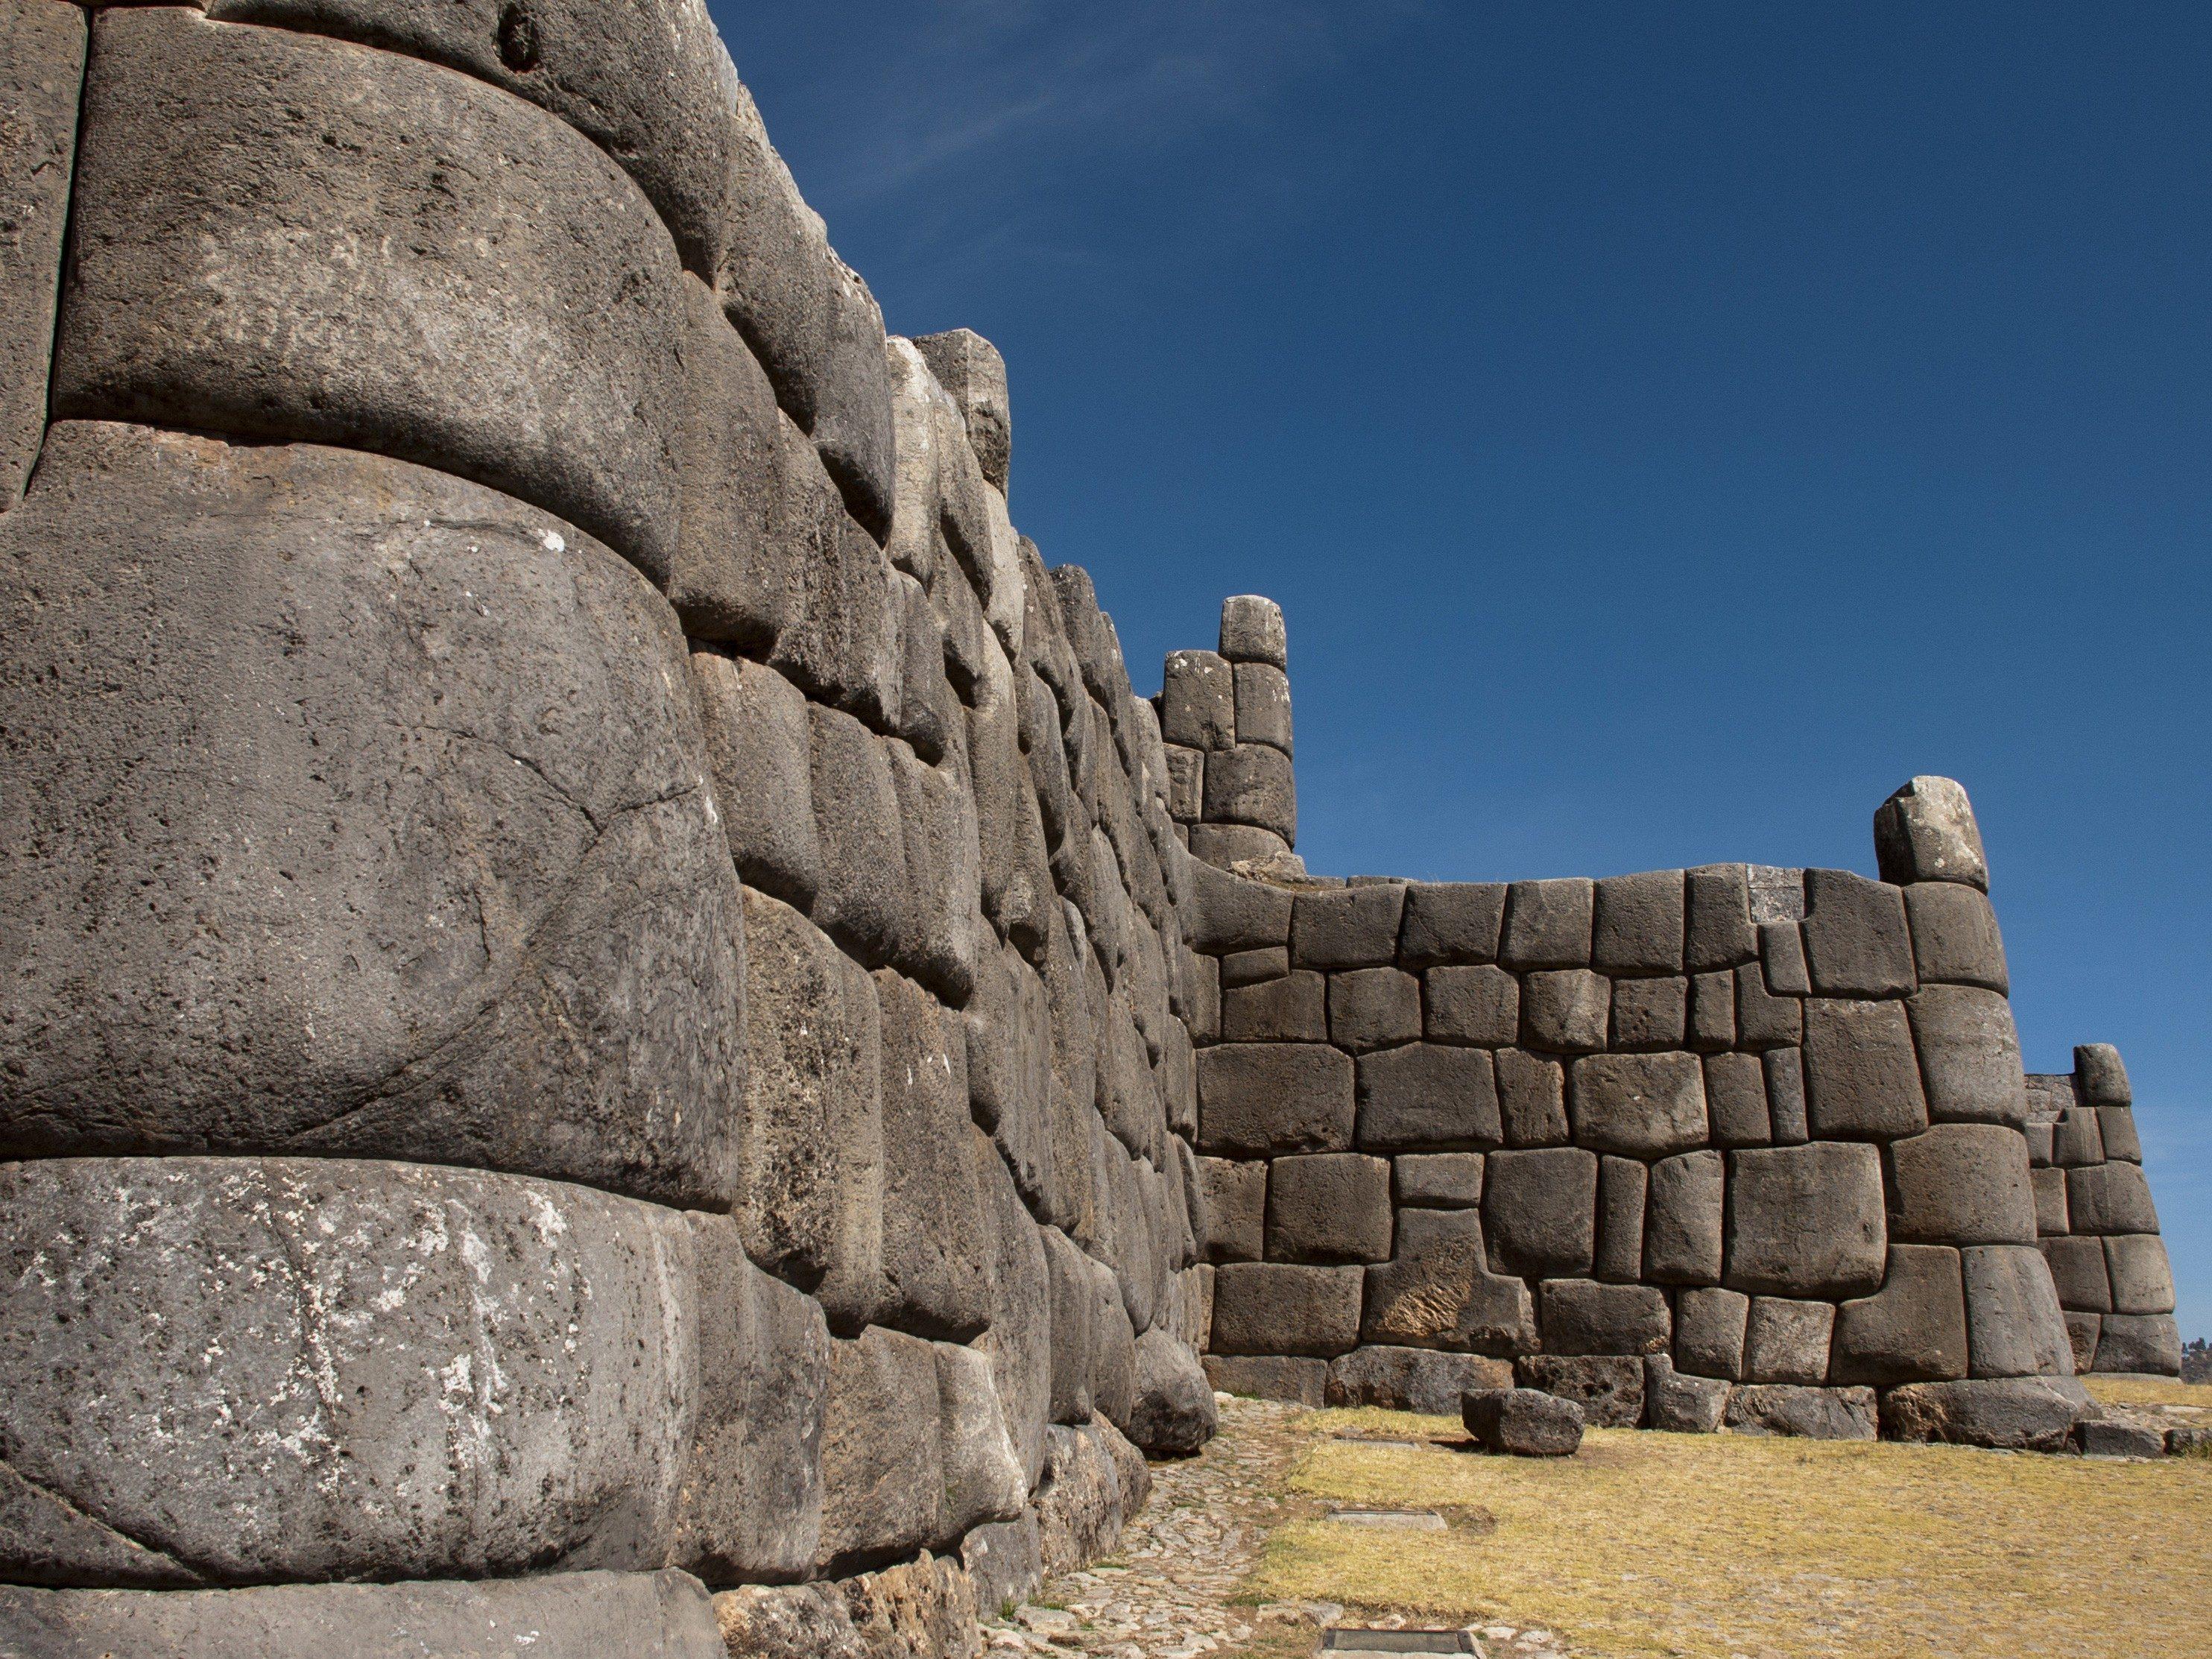 Stupendous Structure of the Inca Empire: Sacsaywaman - Peru